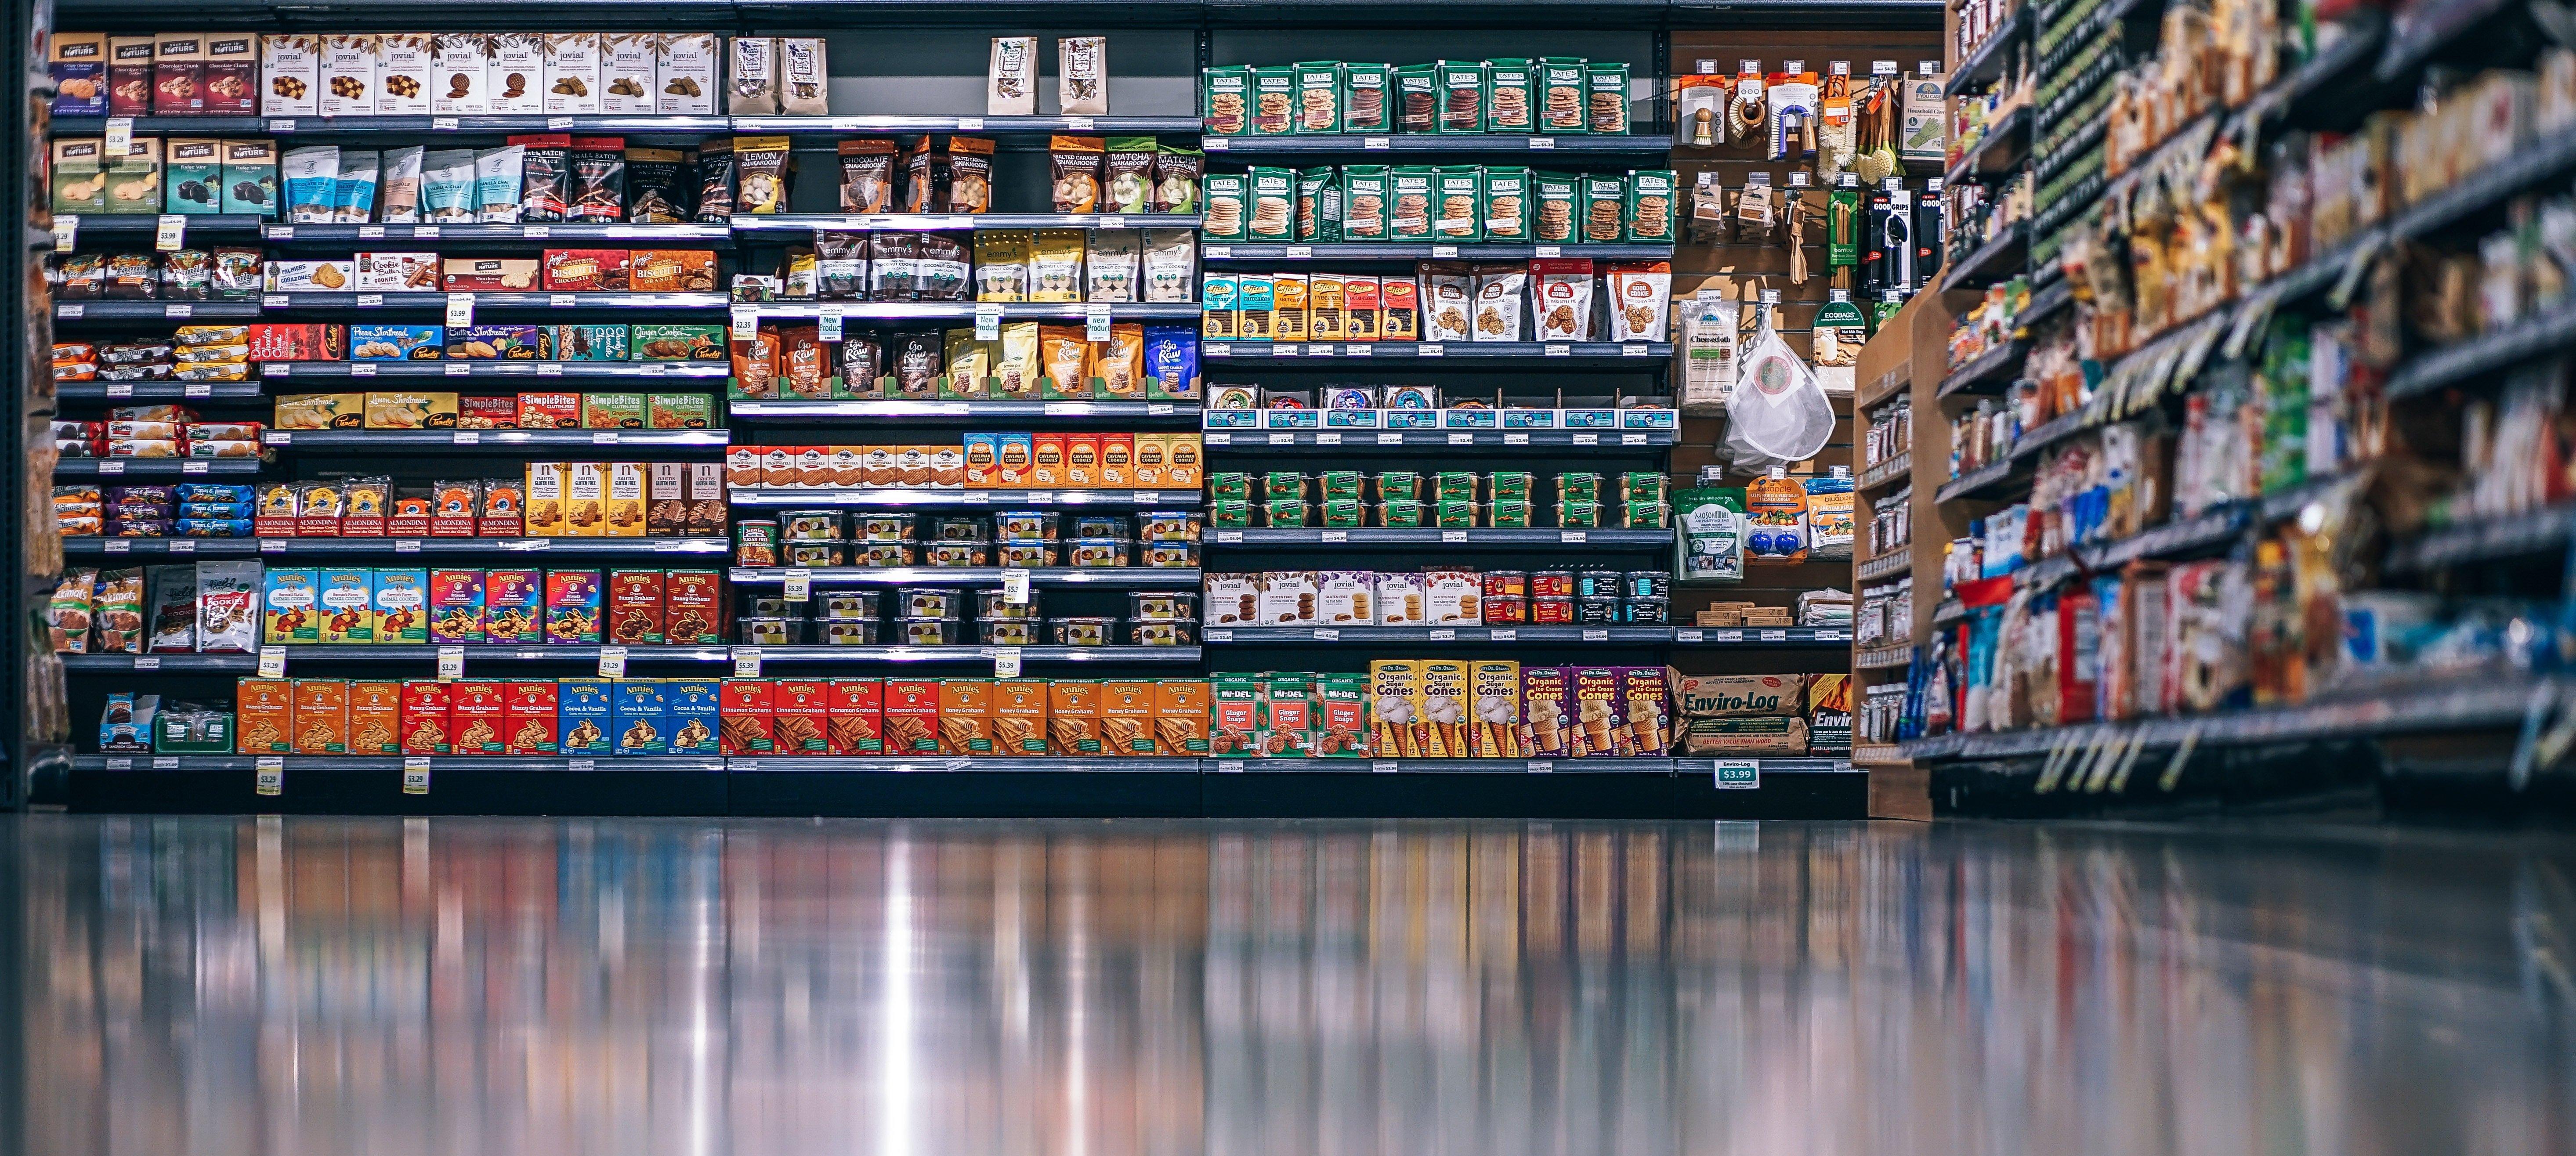 Sunshine Coast IGA Supermarket For Sale